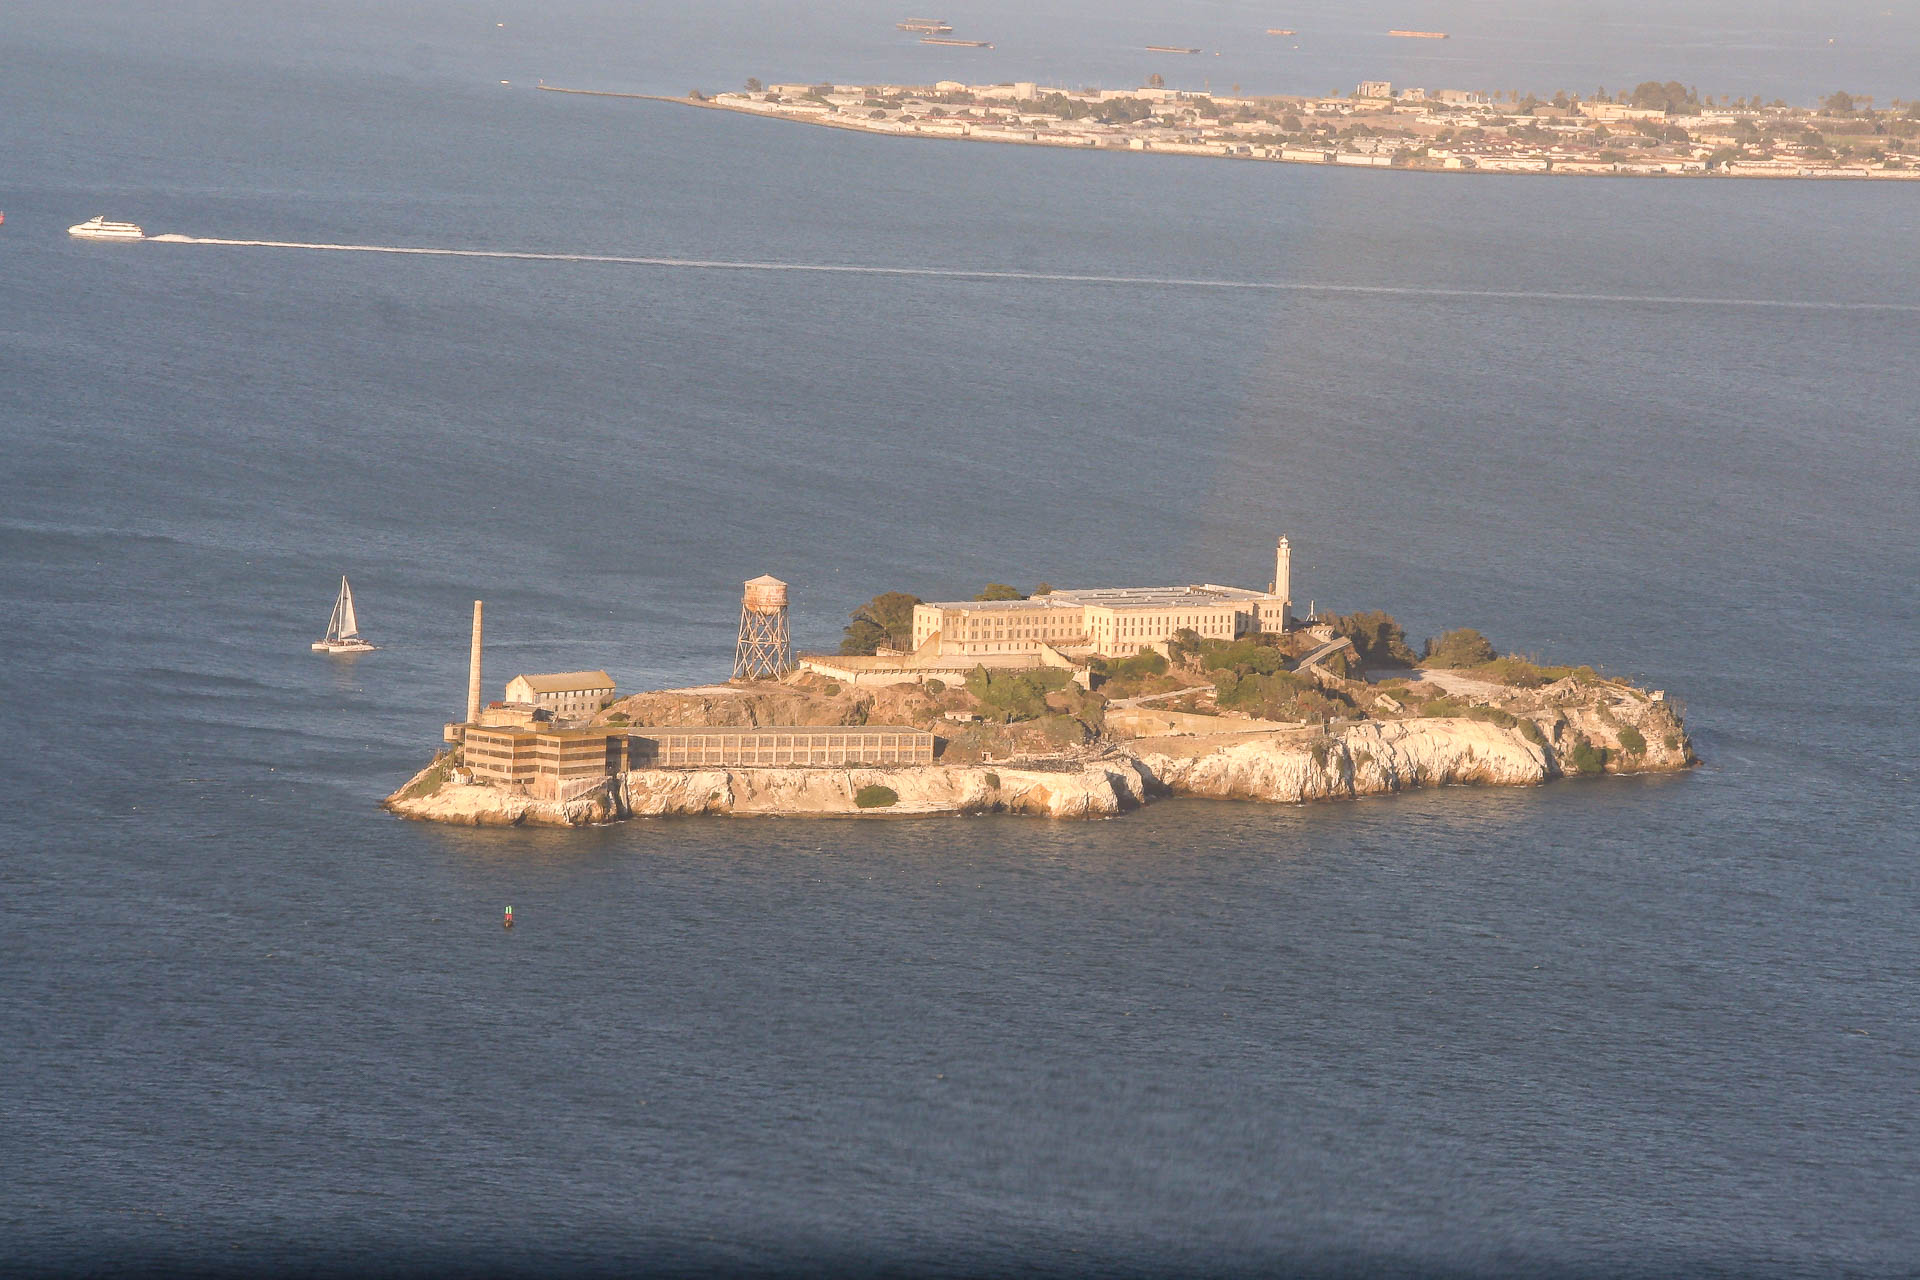 Alcatraz von oben